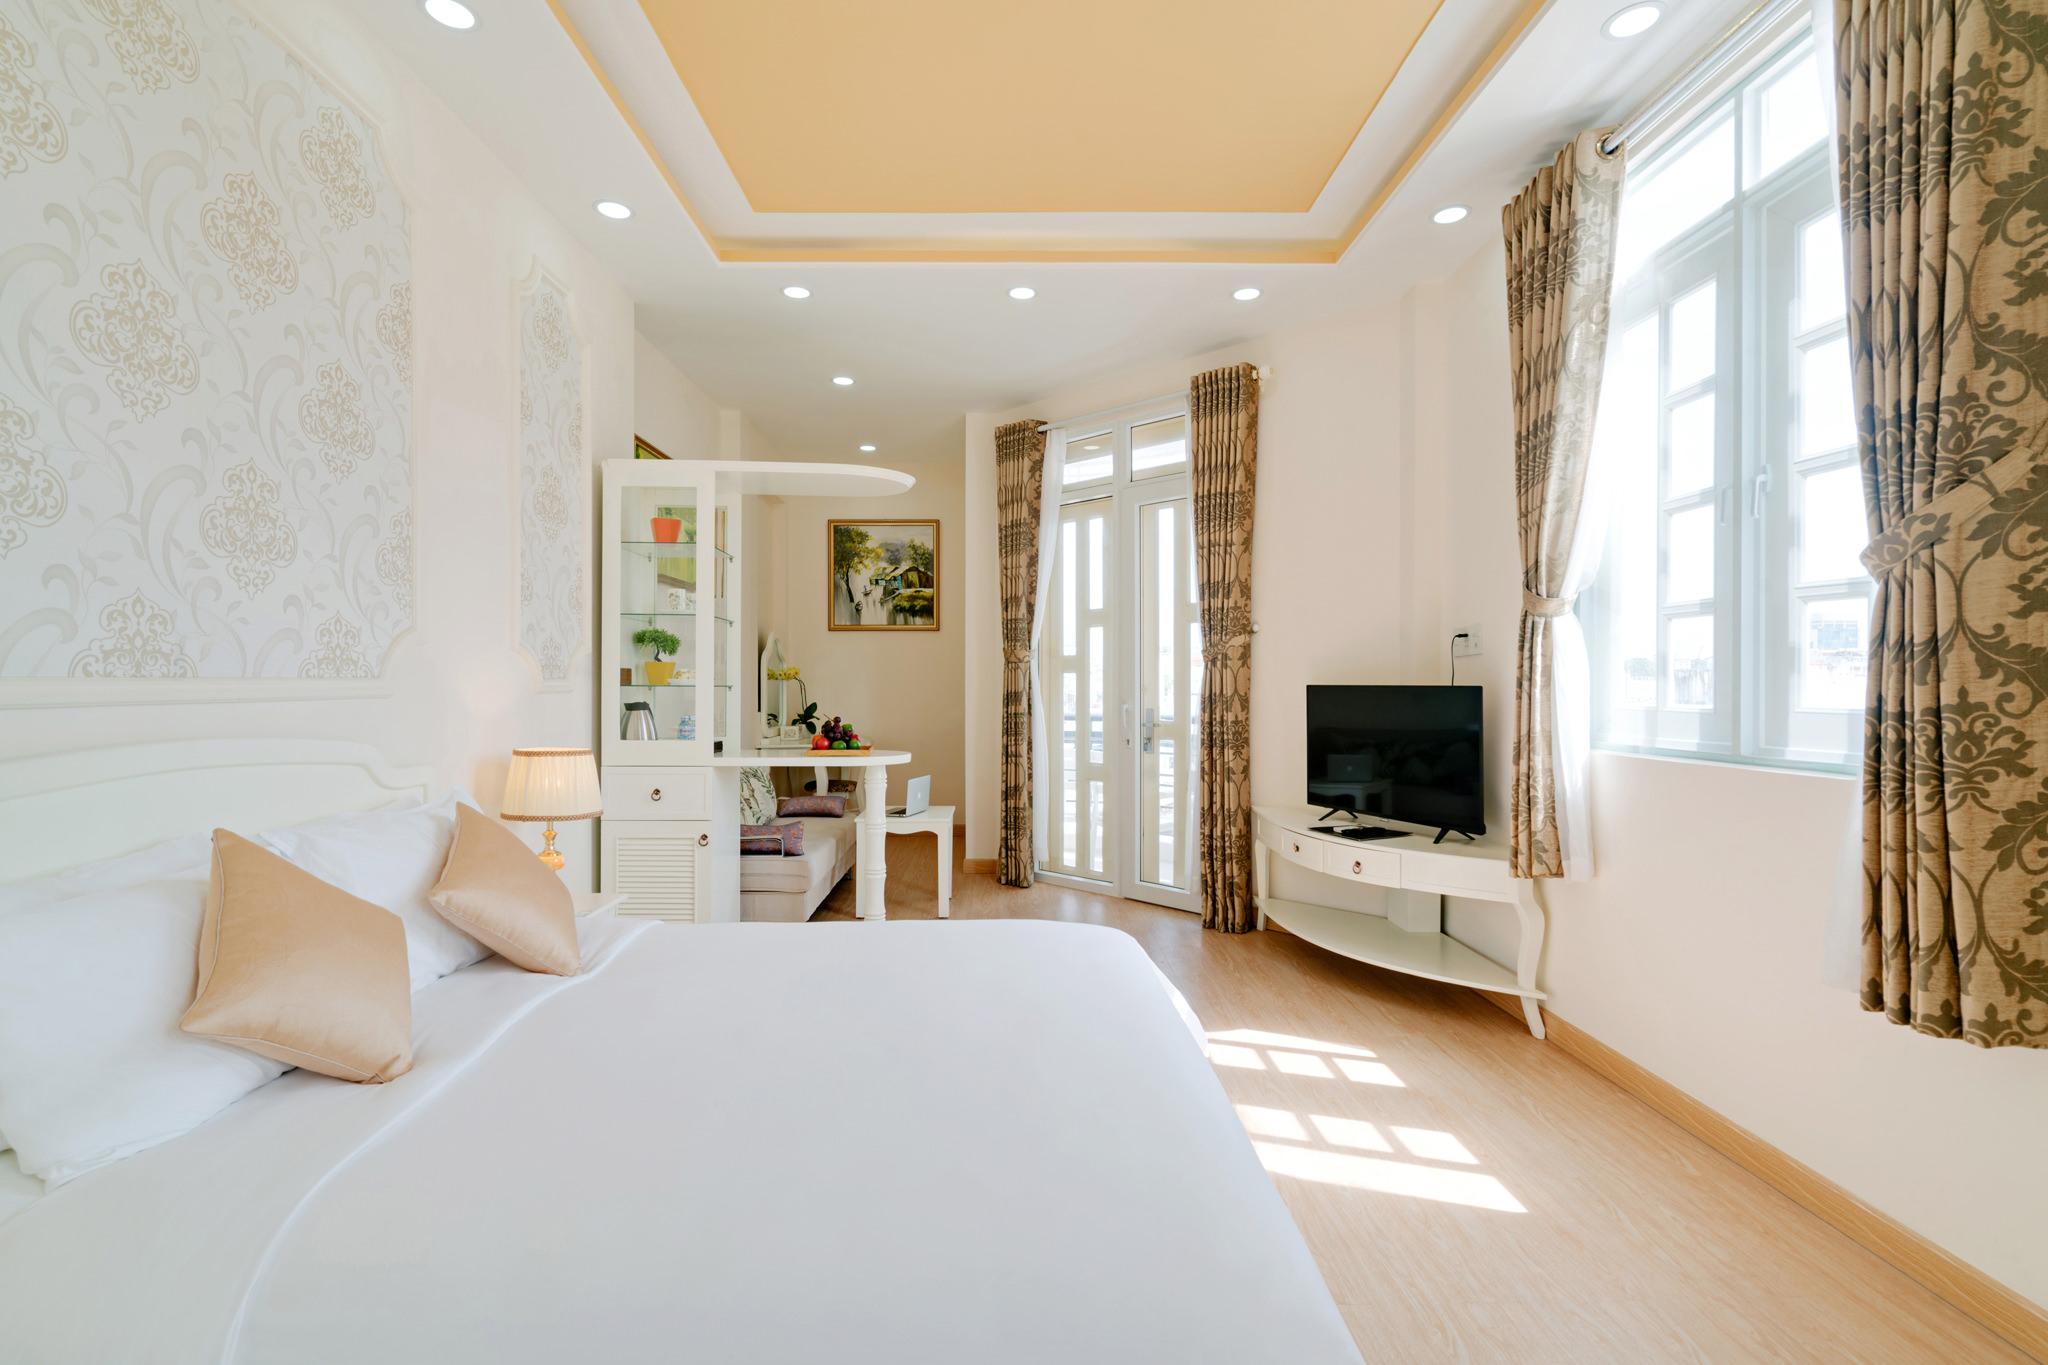 20180529 - Chez Mimosa - Interior - Hotel - 013.jpg